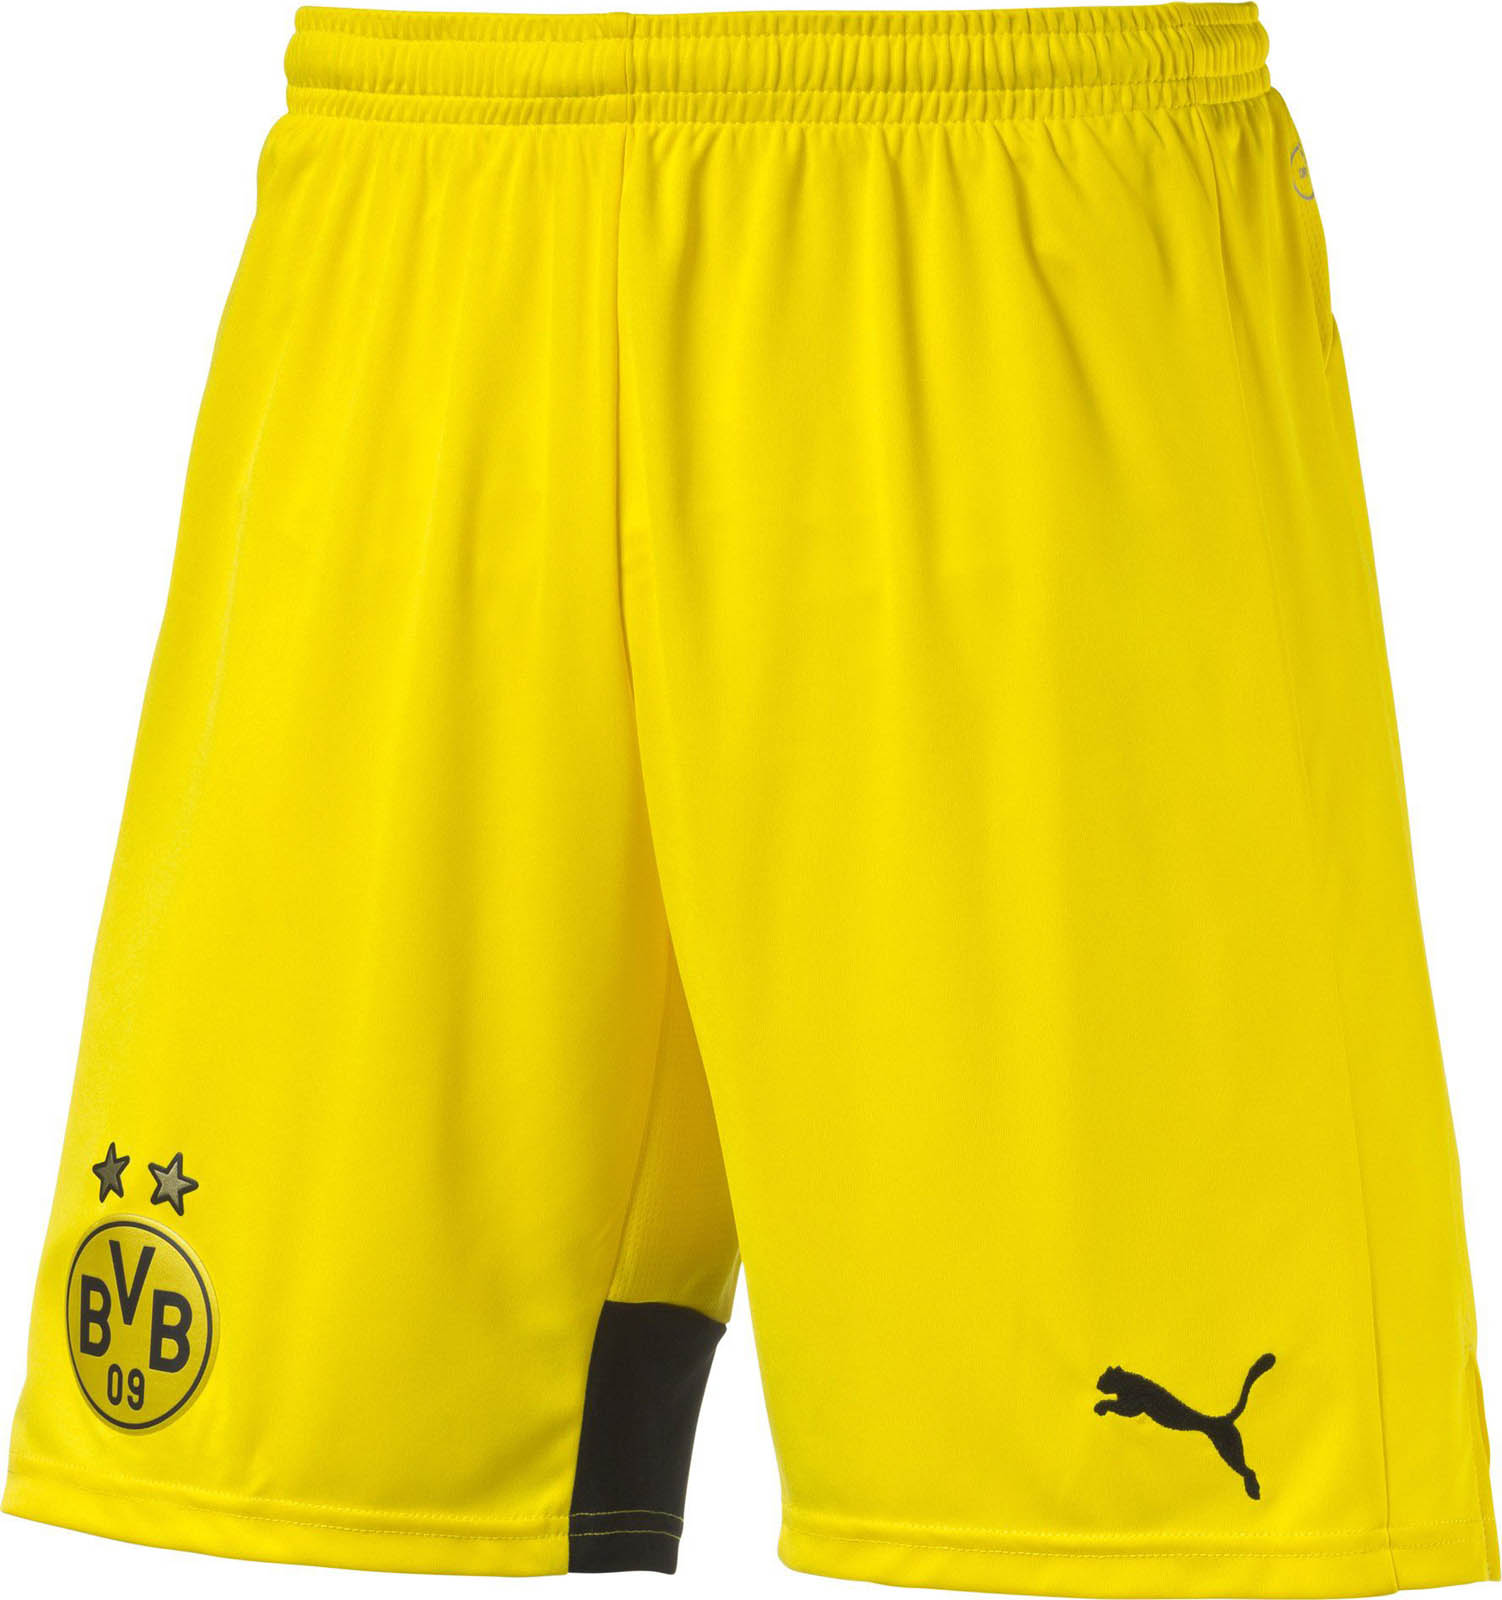 Dortmund Europa League Qualifiziert